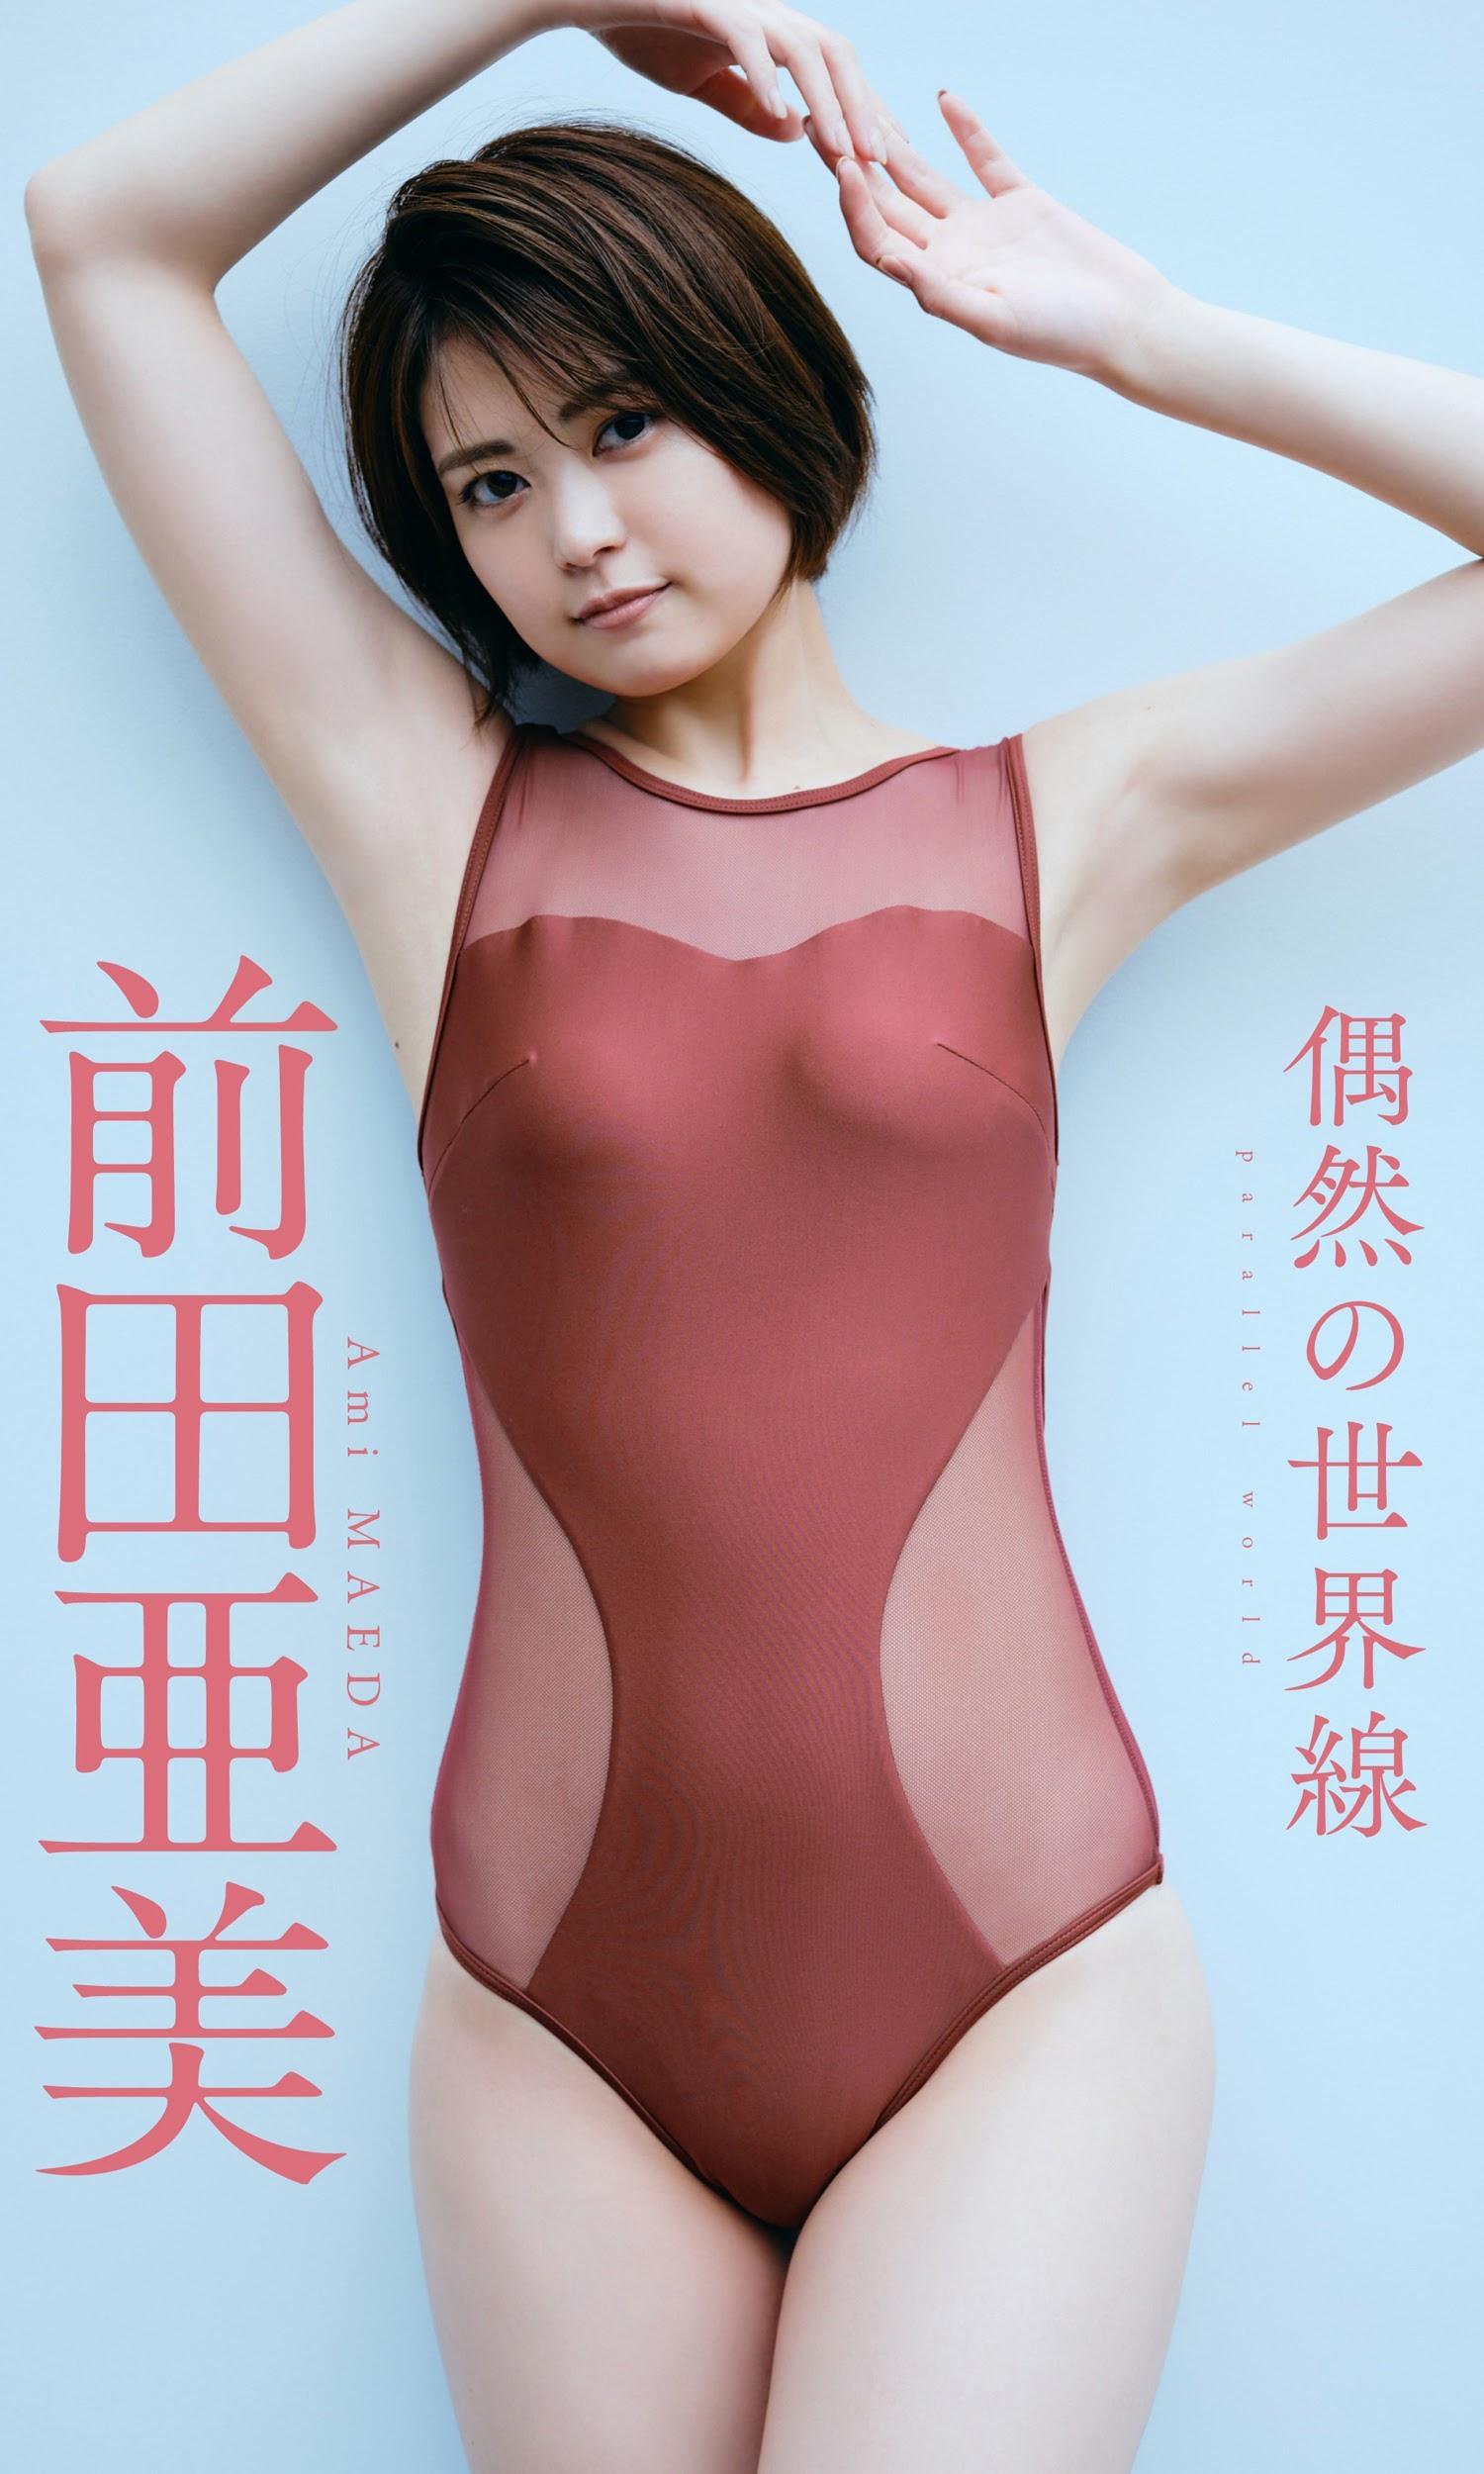 今田美樱-WEEKLY PLAYBOY 2021年第二十四期  高清套图 第31张